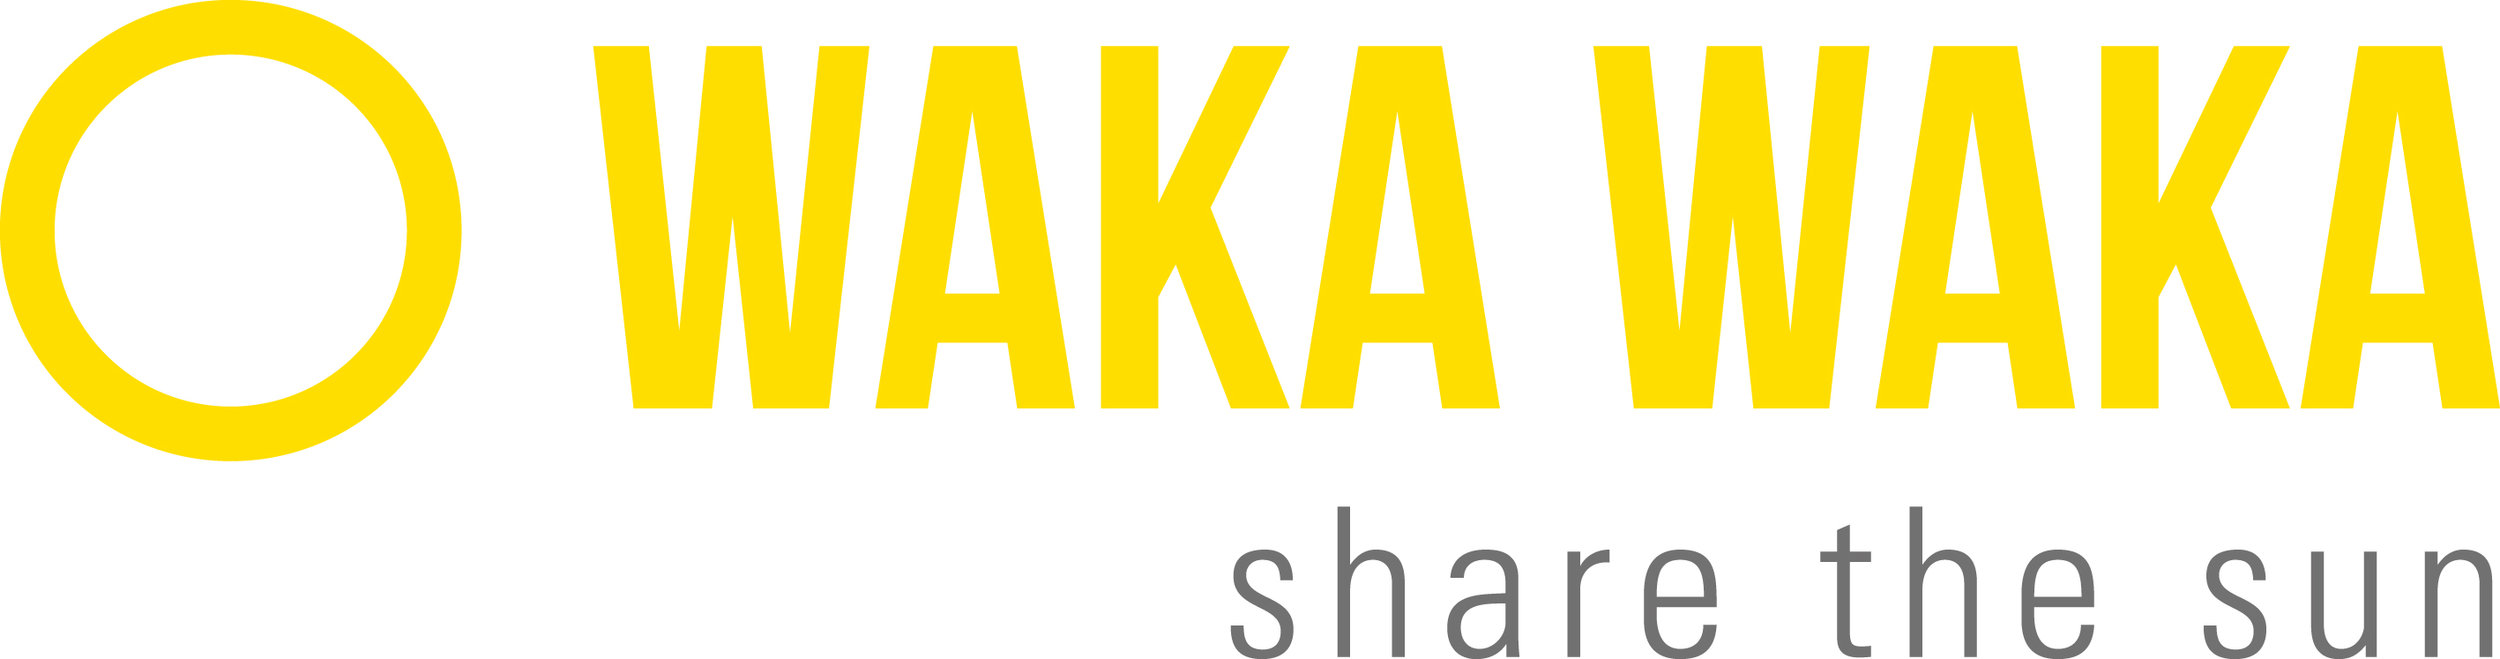 Waka-Waka1.jpg